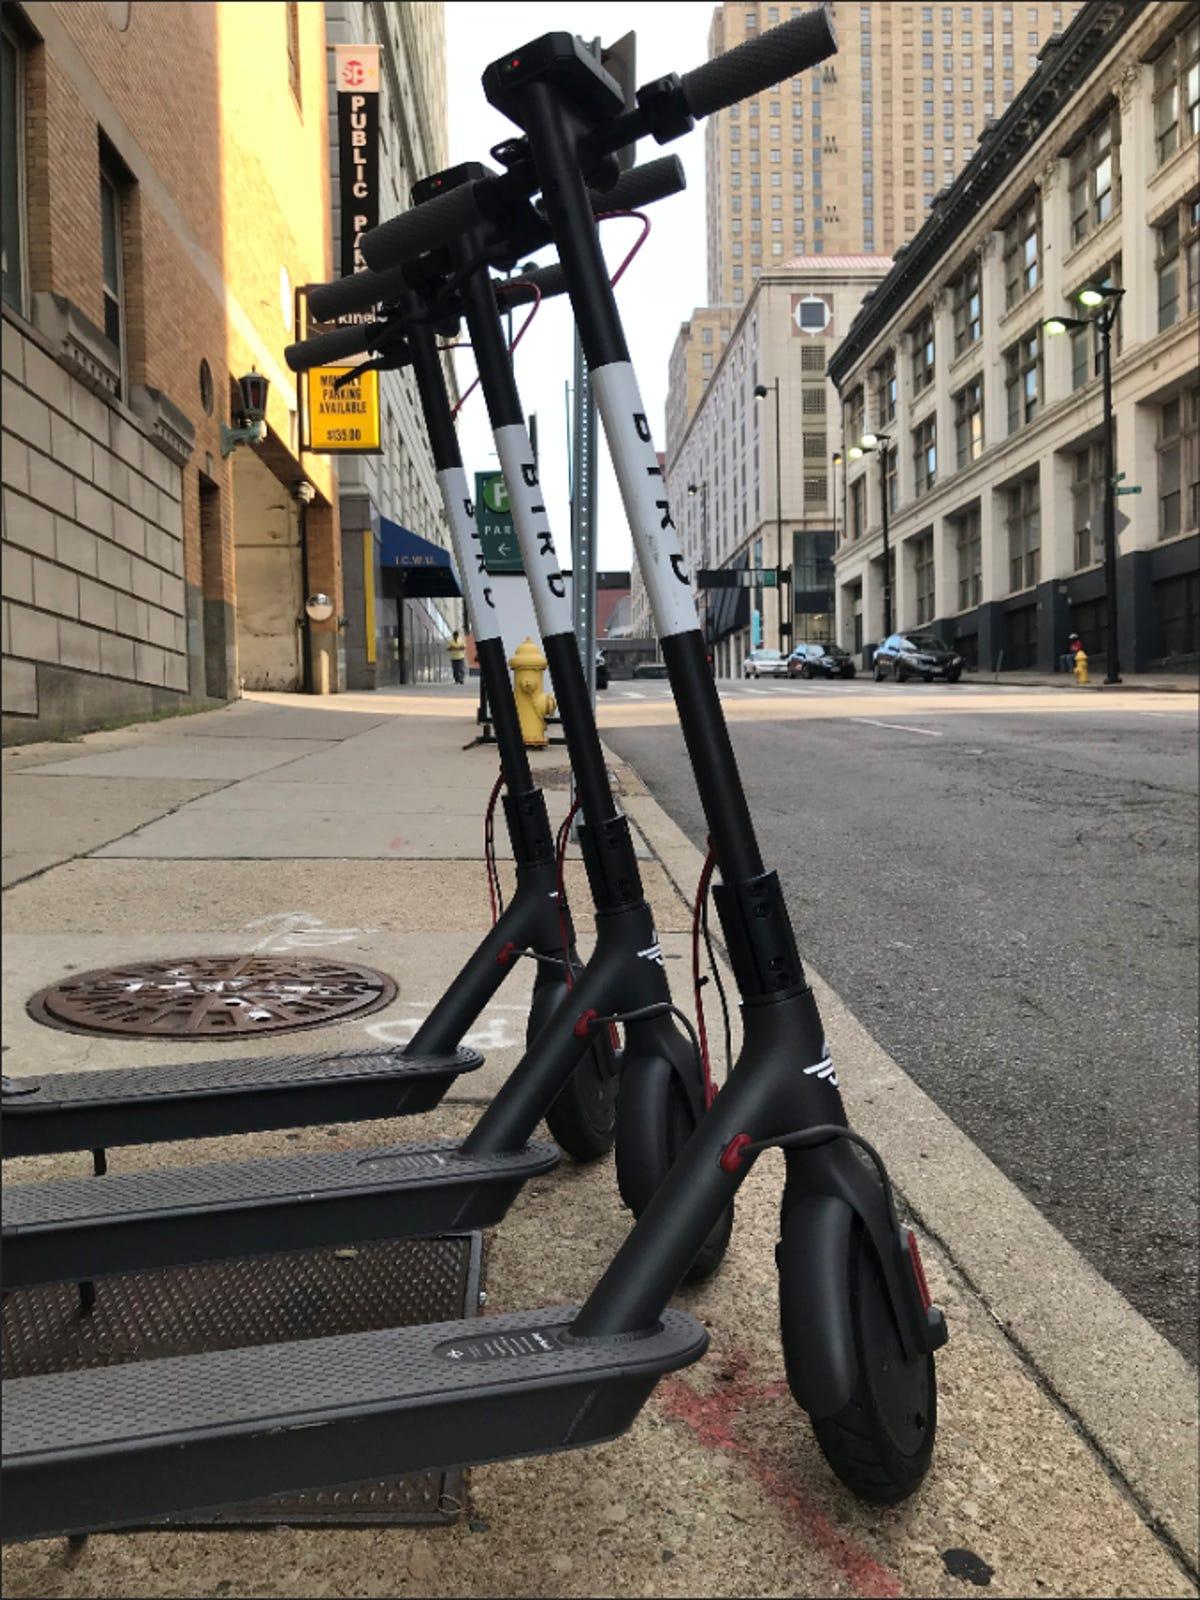 Bird scooters: How do Bird scooters work?